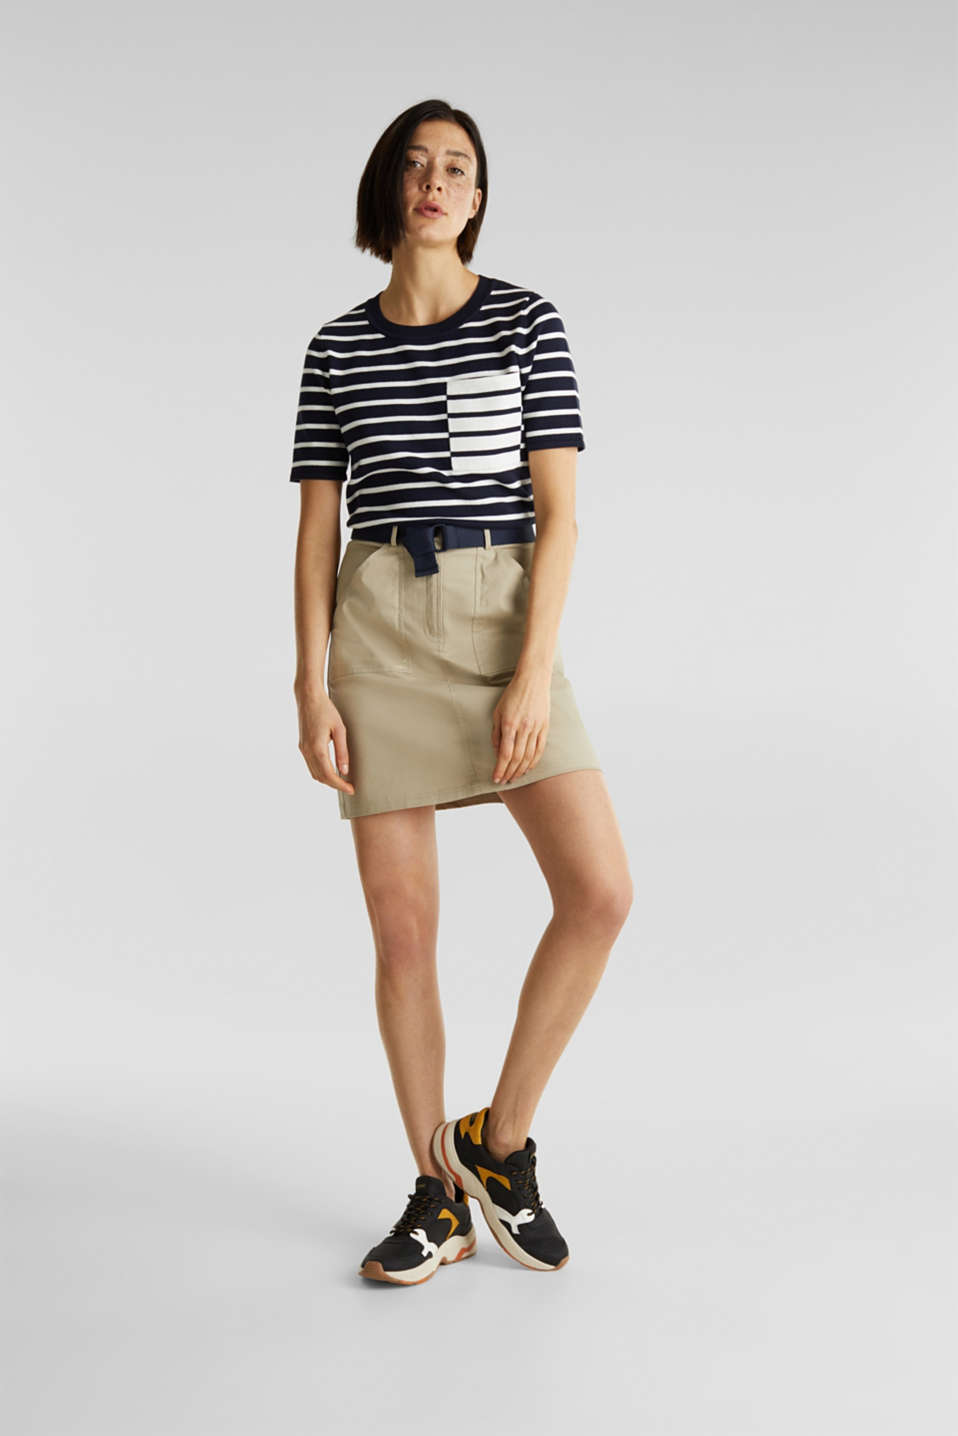 Short-sleeved jumper with a breast pocket, NAVY, detail image number 1